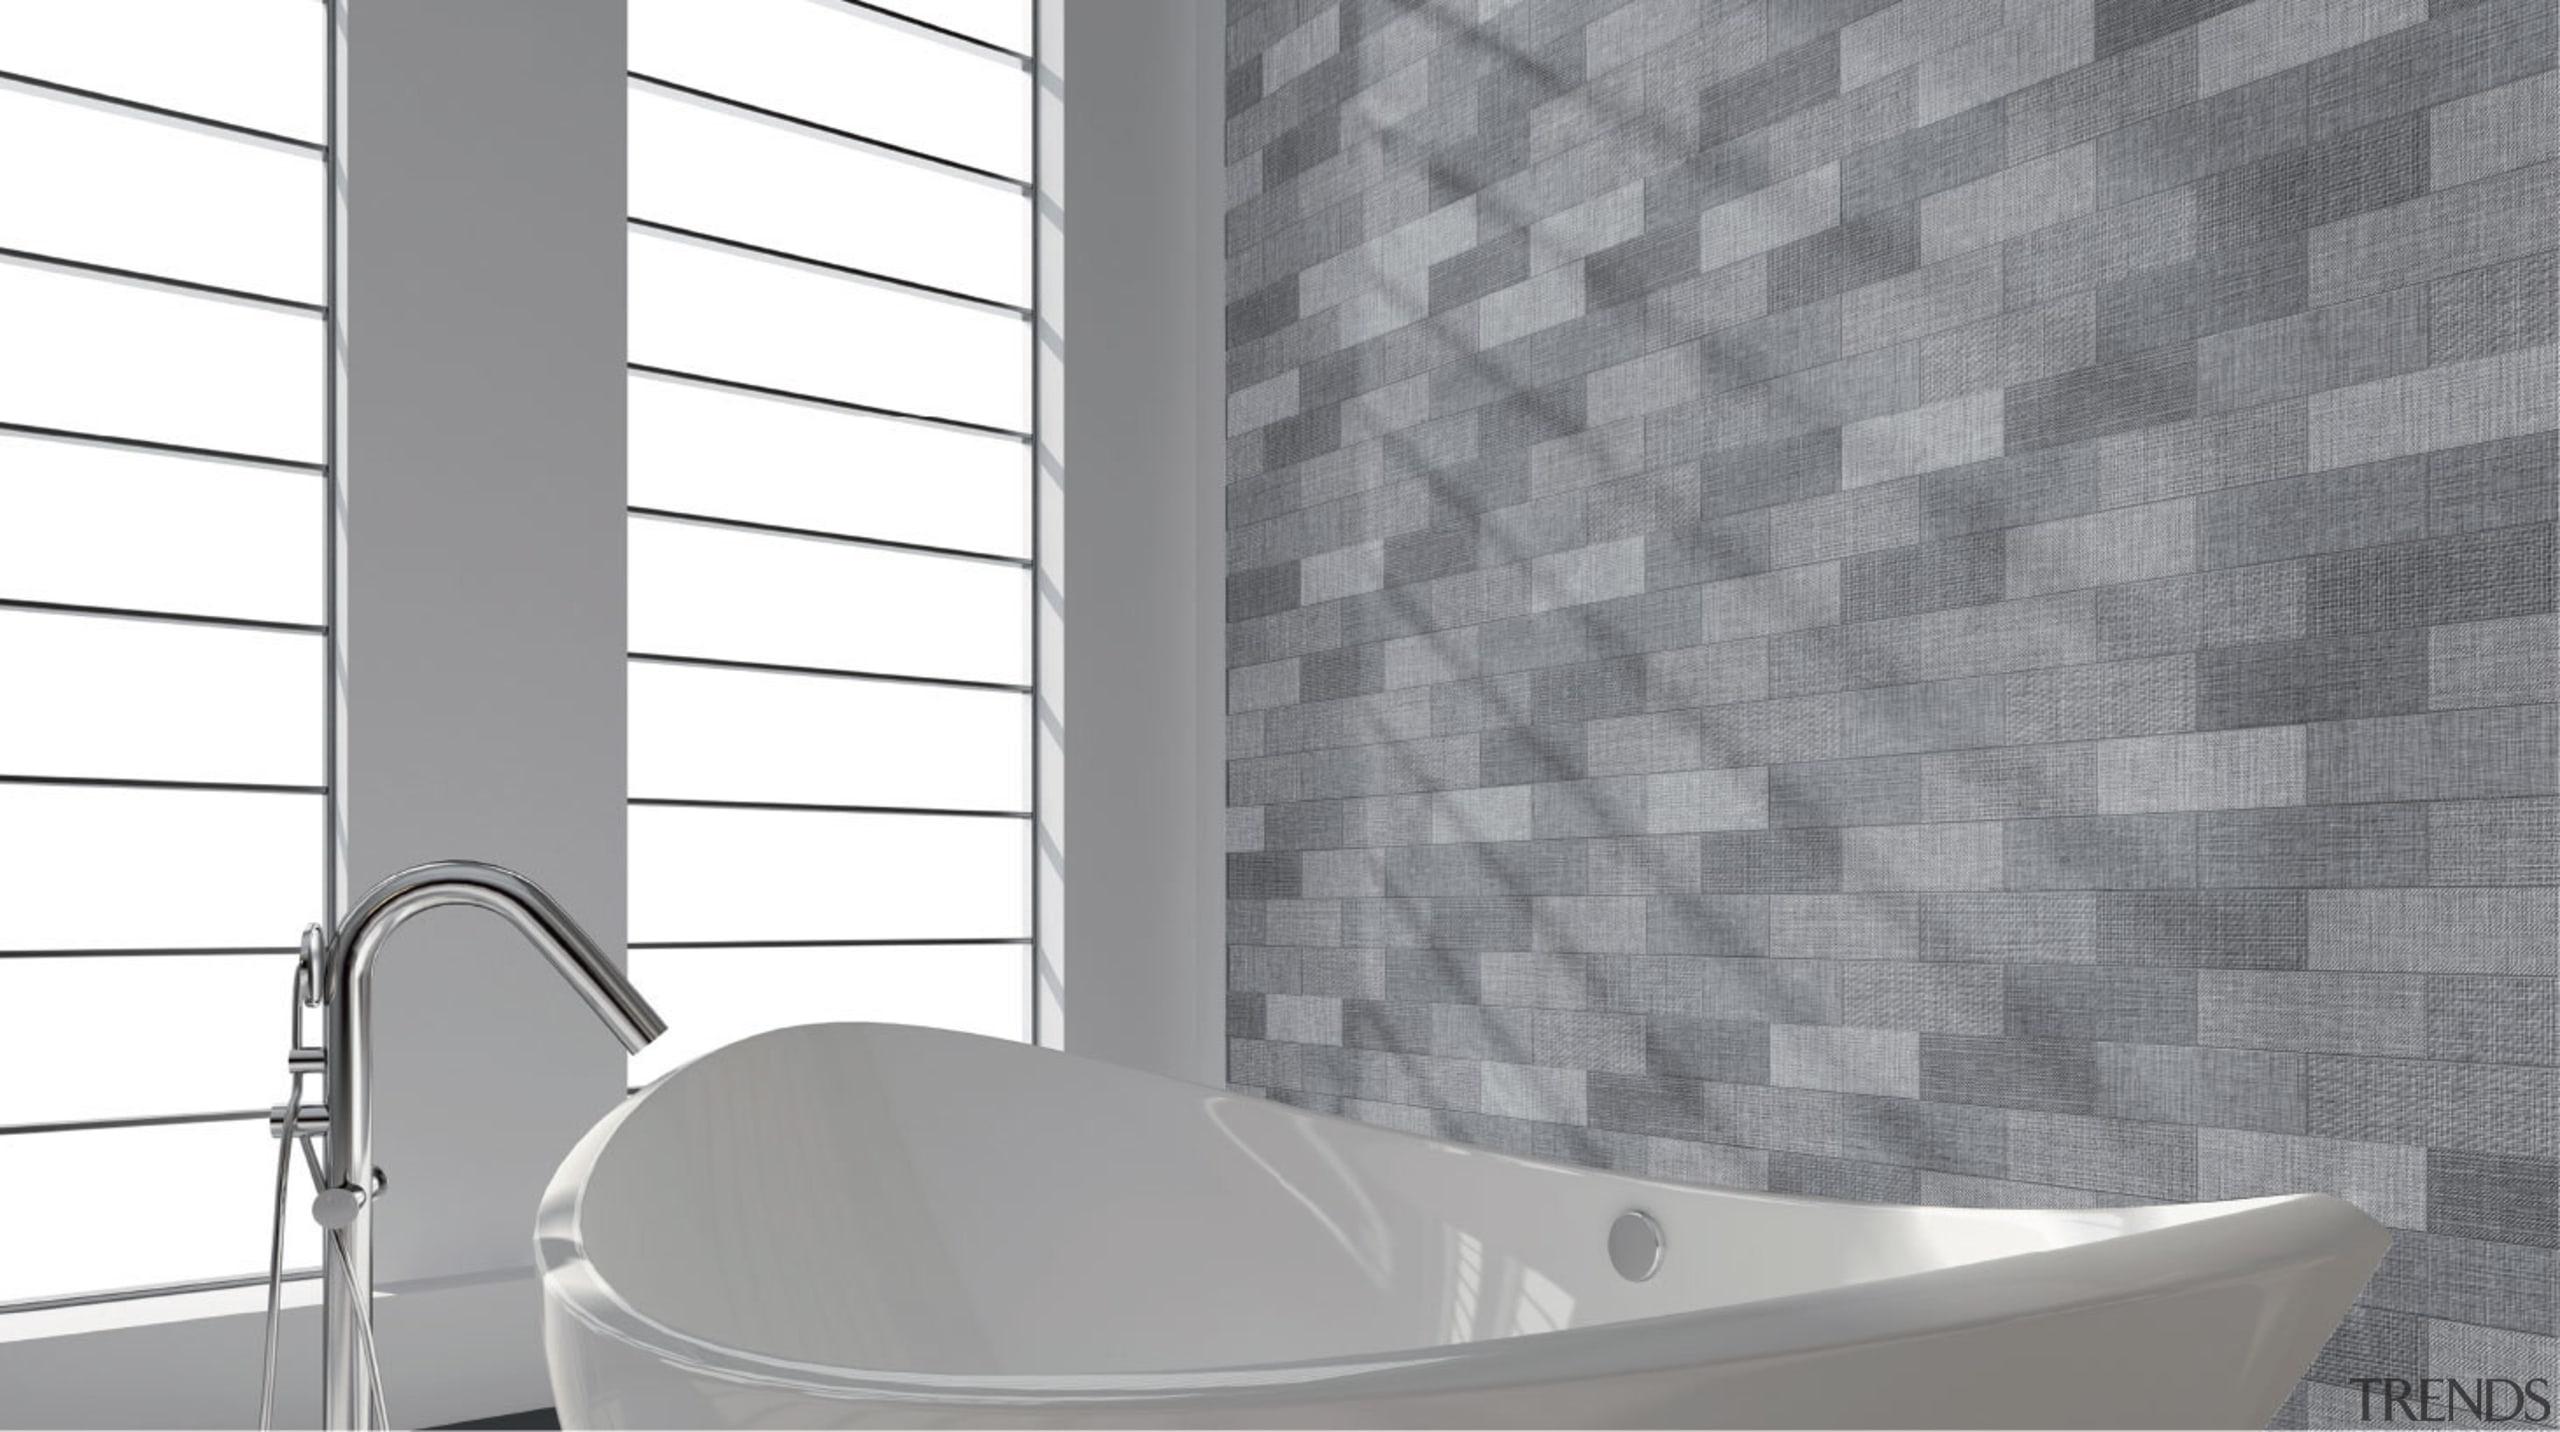 Brick Text Grey 90x300 - Brick Text Grey angle, bathroom, black and white, ceramic, daylighting, floor, flooring, interior design, product, tap, tile, wall, window, gray